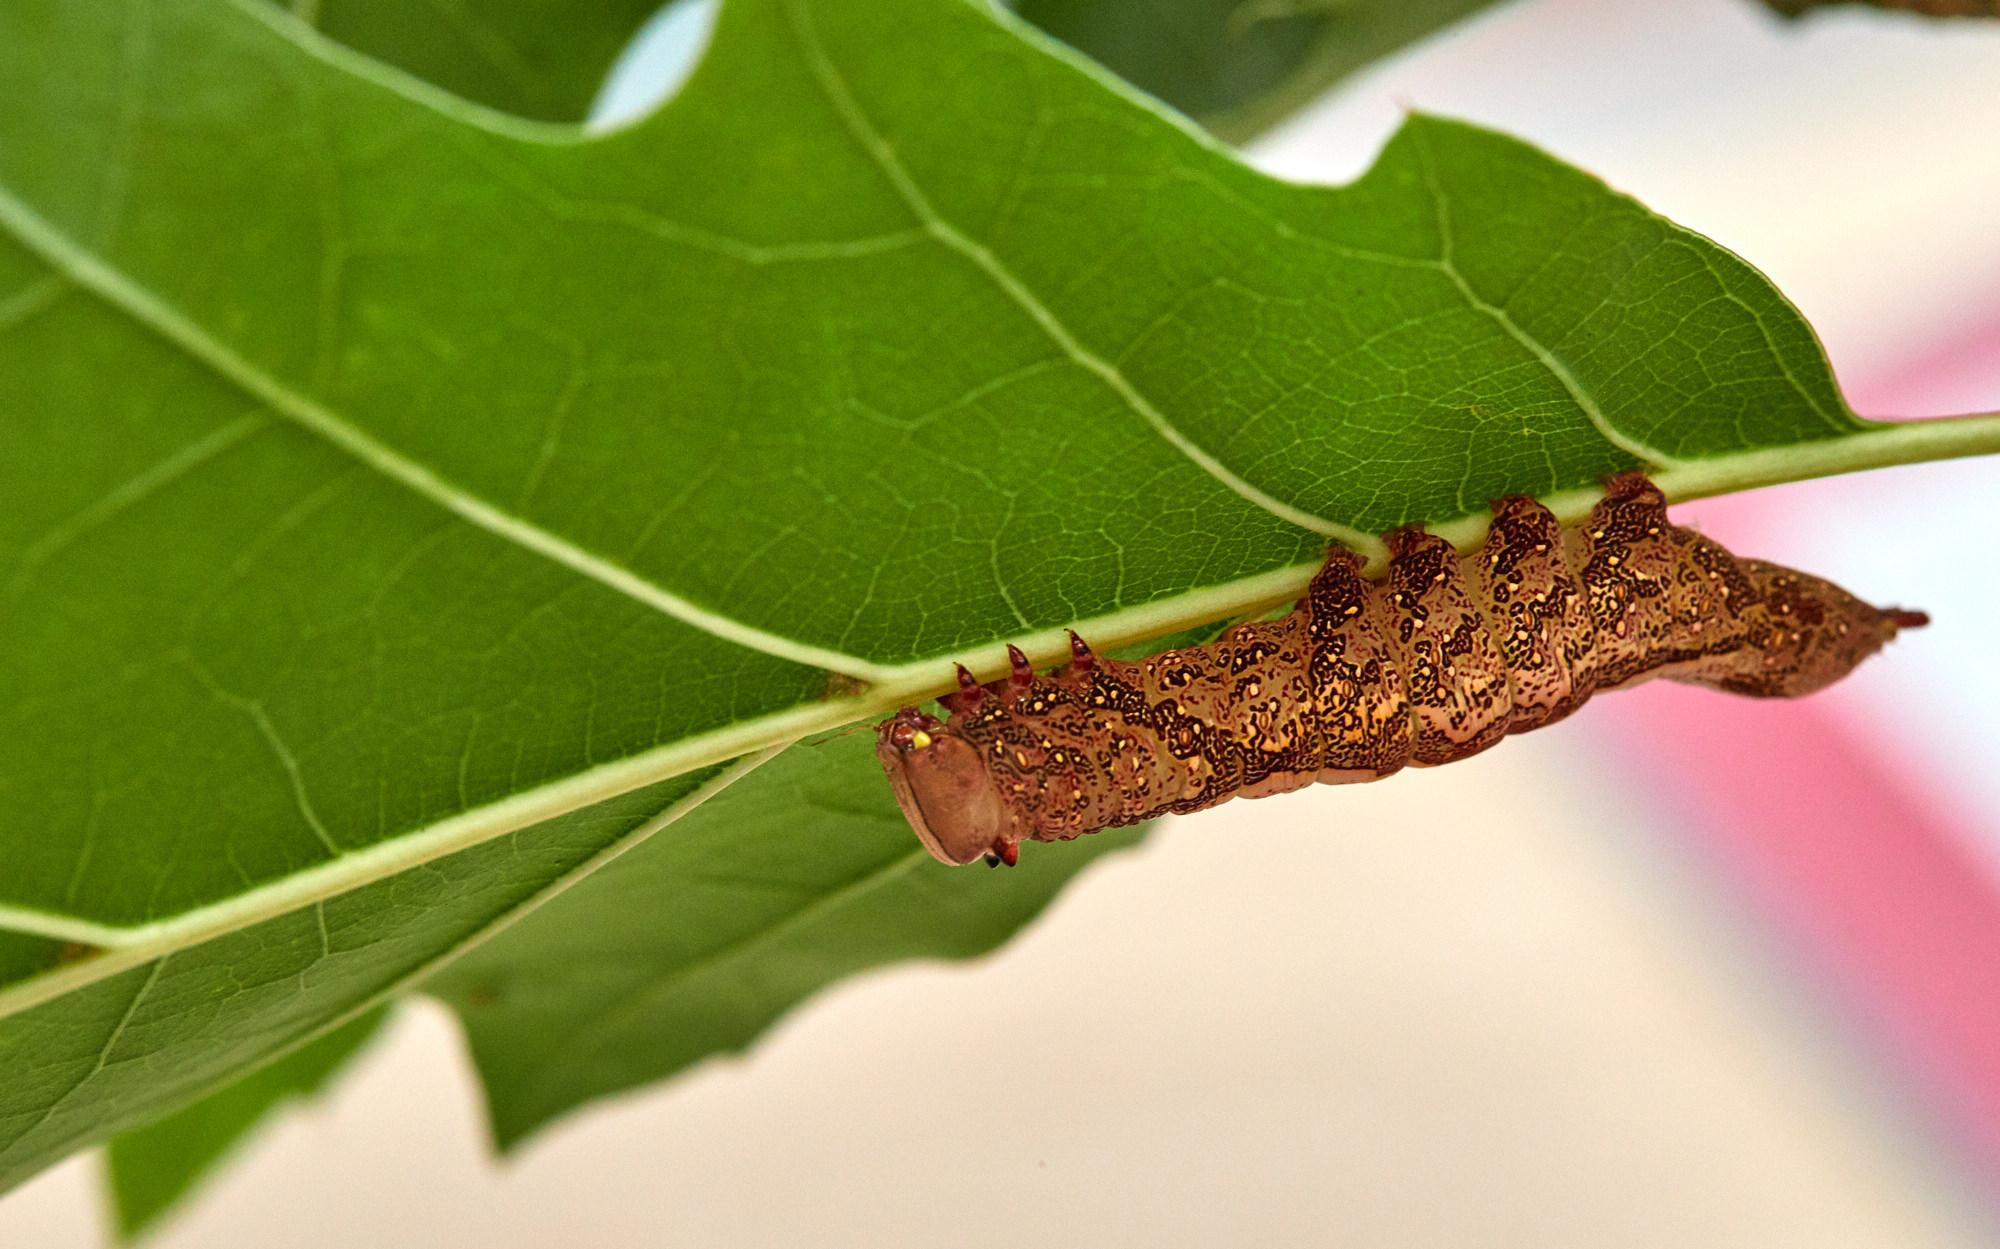 Caterpillars - 2016    - 40286- 000102.jpg